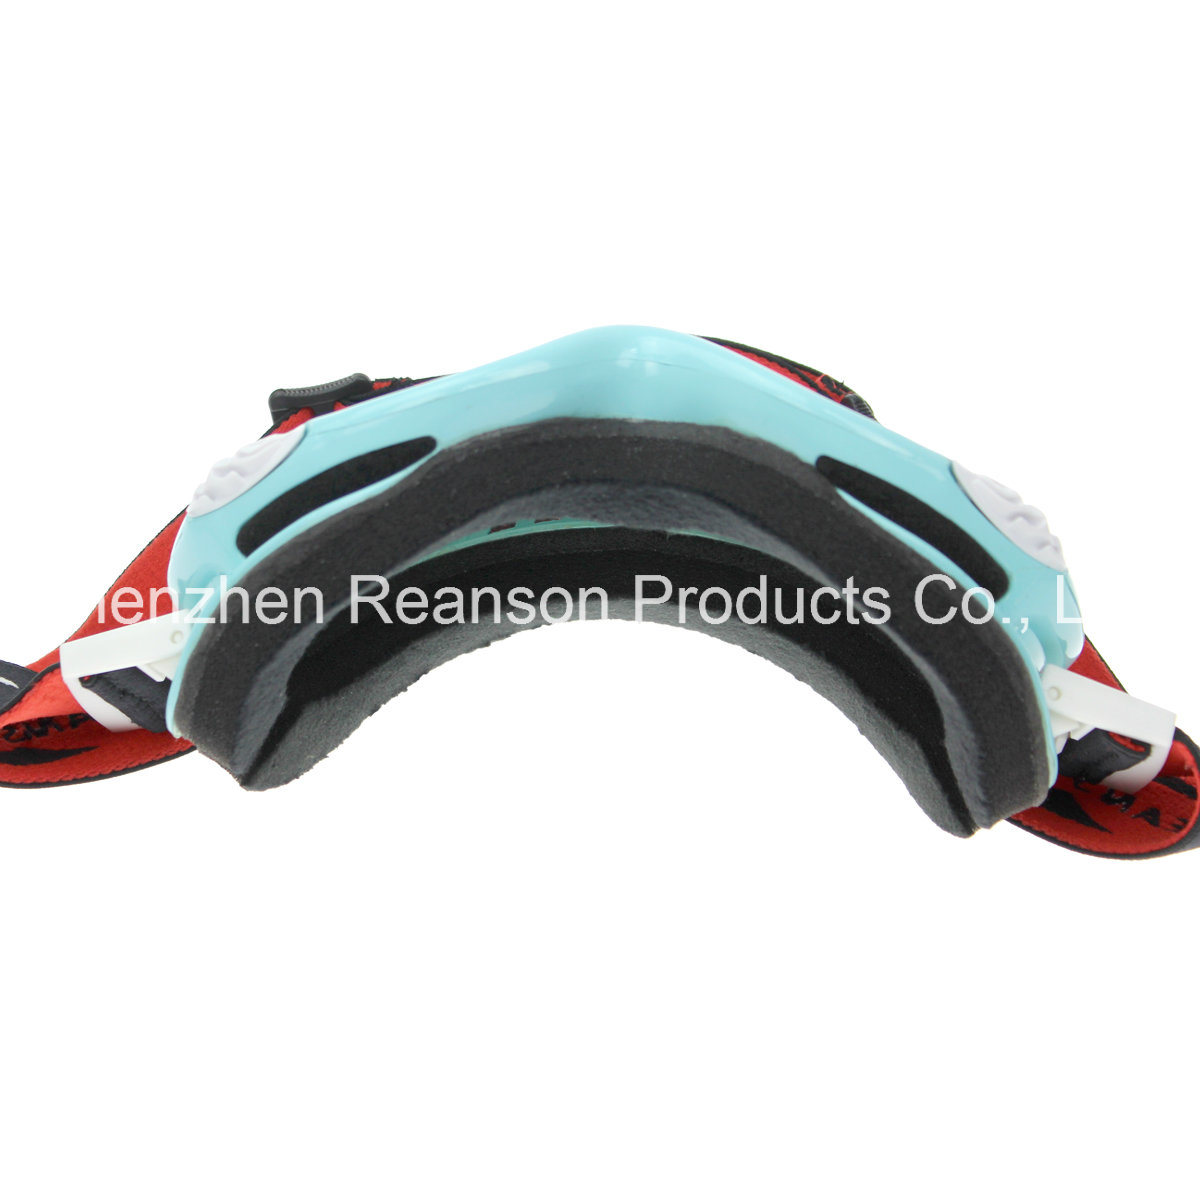 Reanson Professional OTG Anti-Fog Double Lenses Snowboard Skiing Goggles